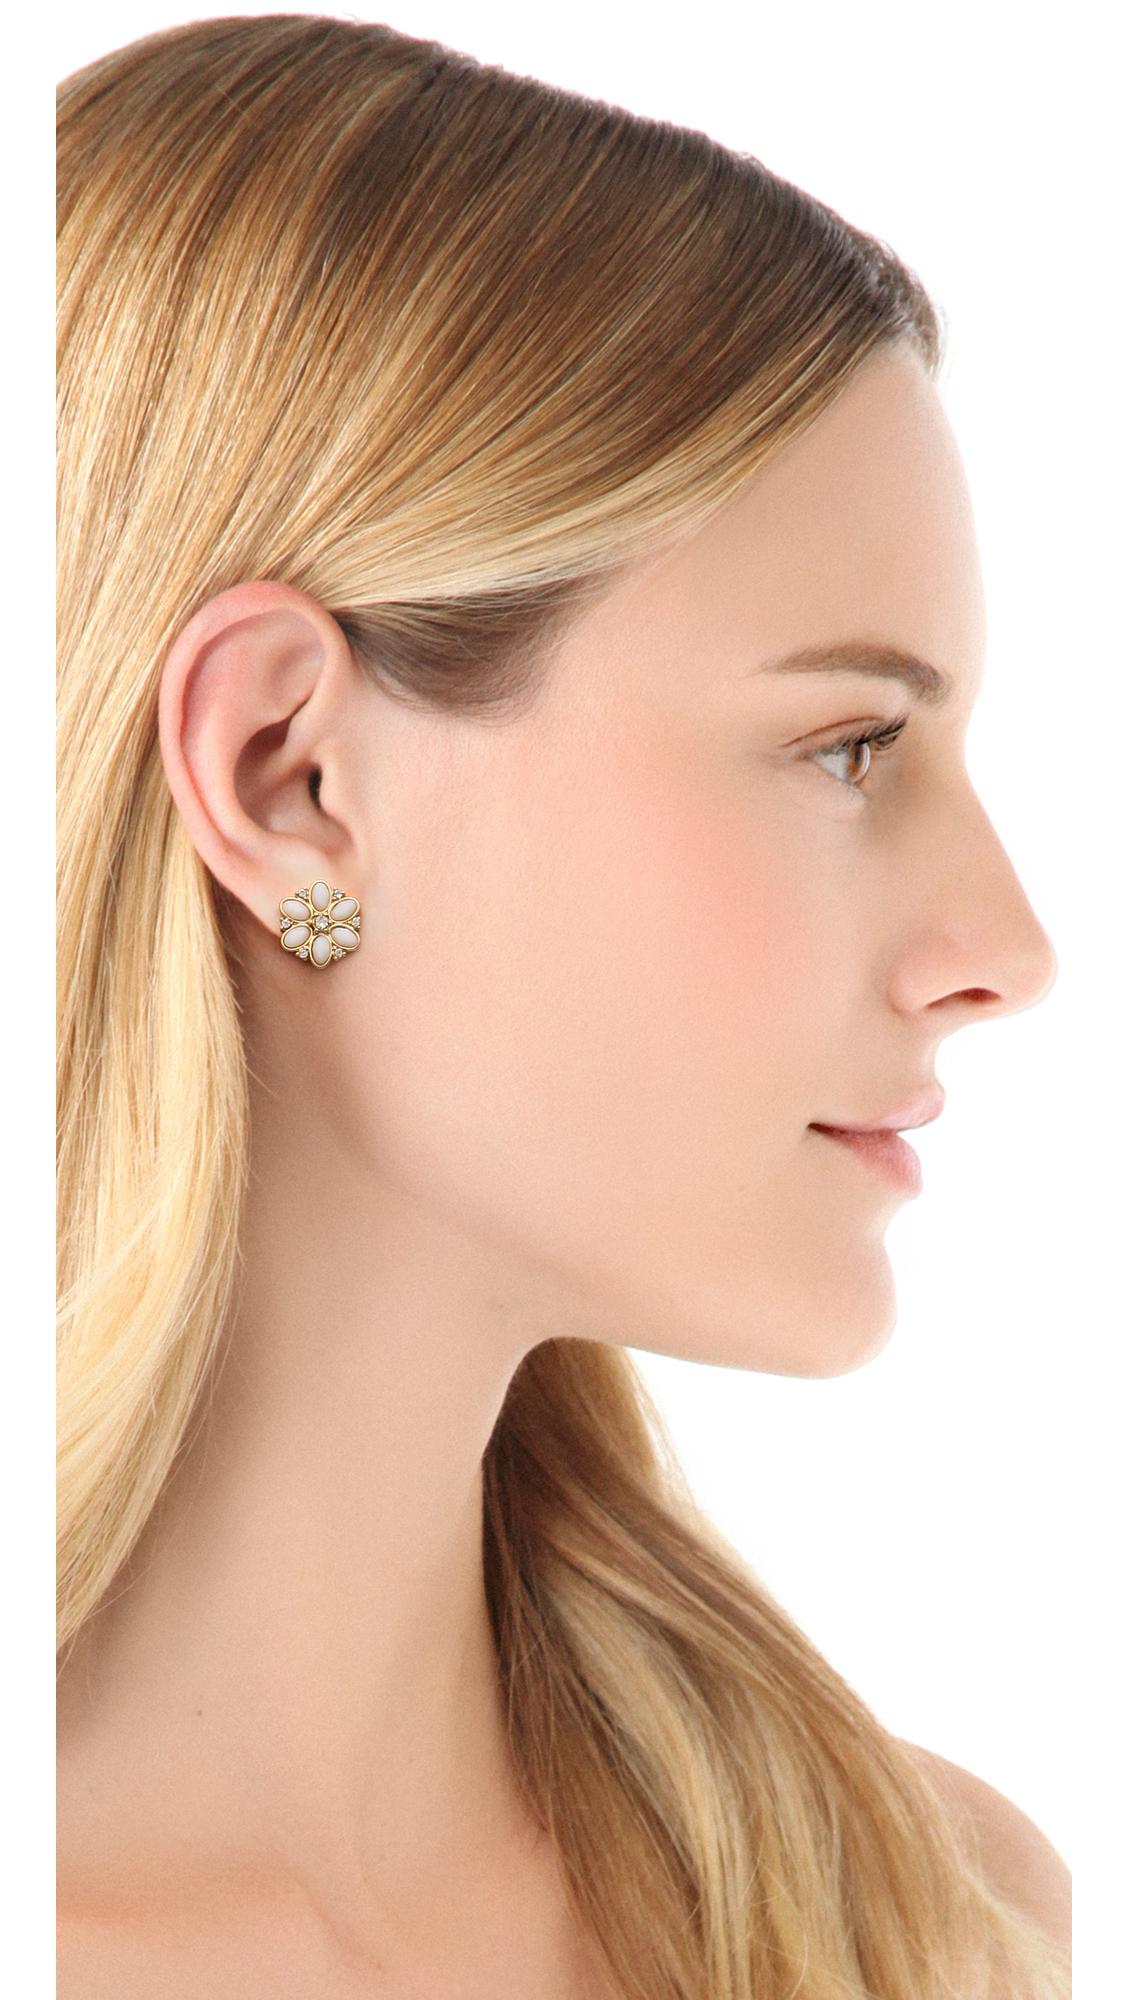 fb3580e311c50f Kate Spade New York Floral Fete Stud Earrings   SHOPBOP